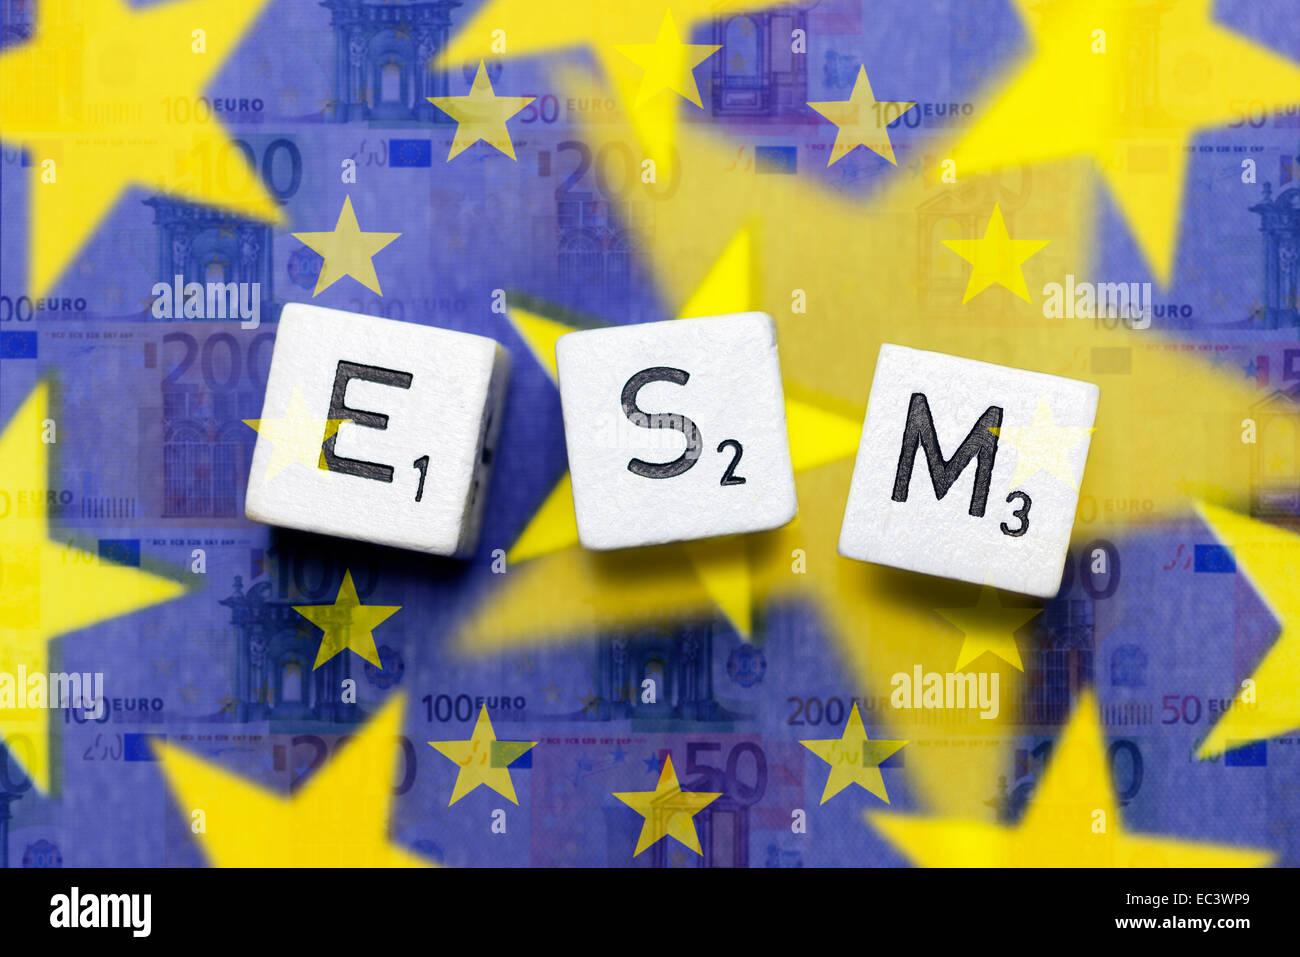 ESM, European Stability Mechanism - Stock Image